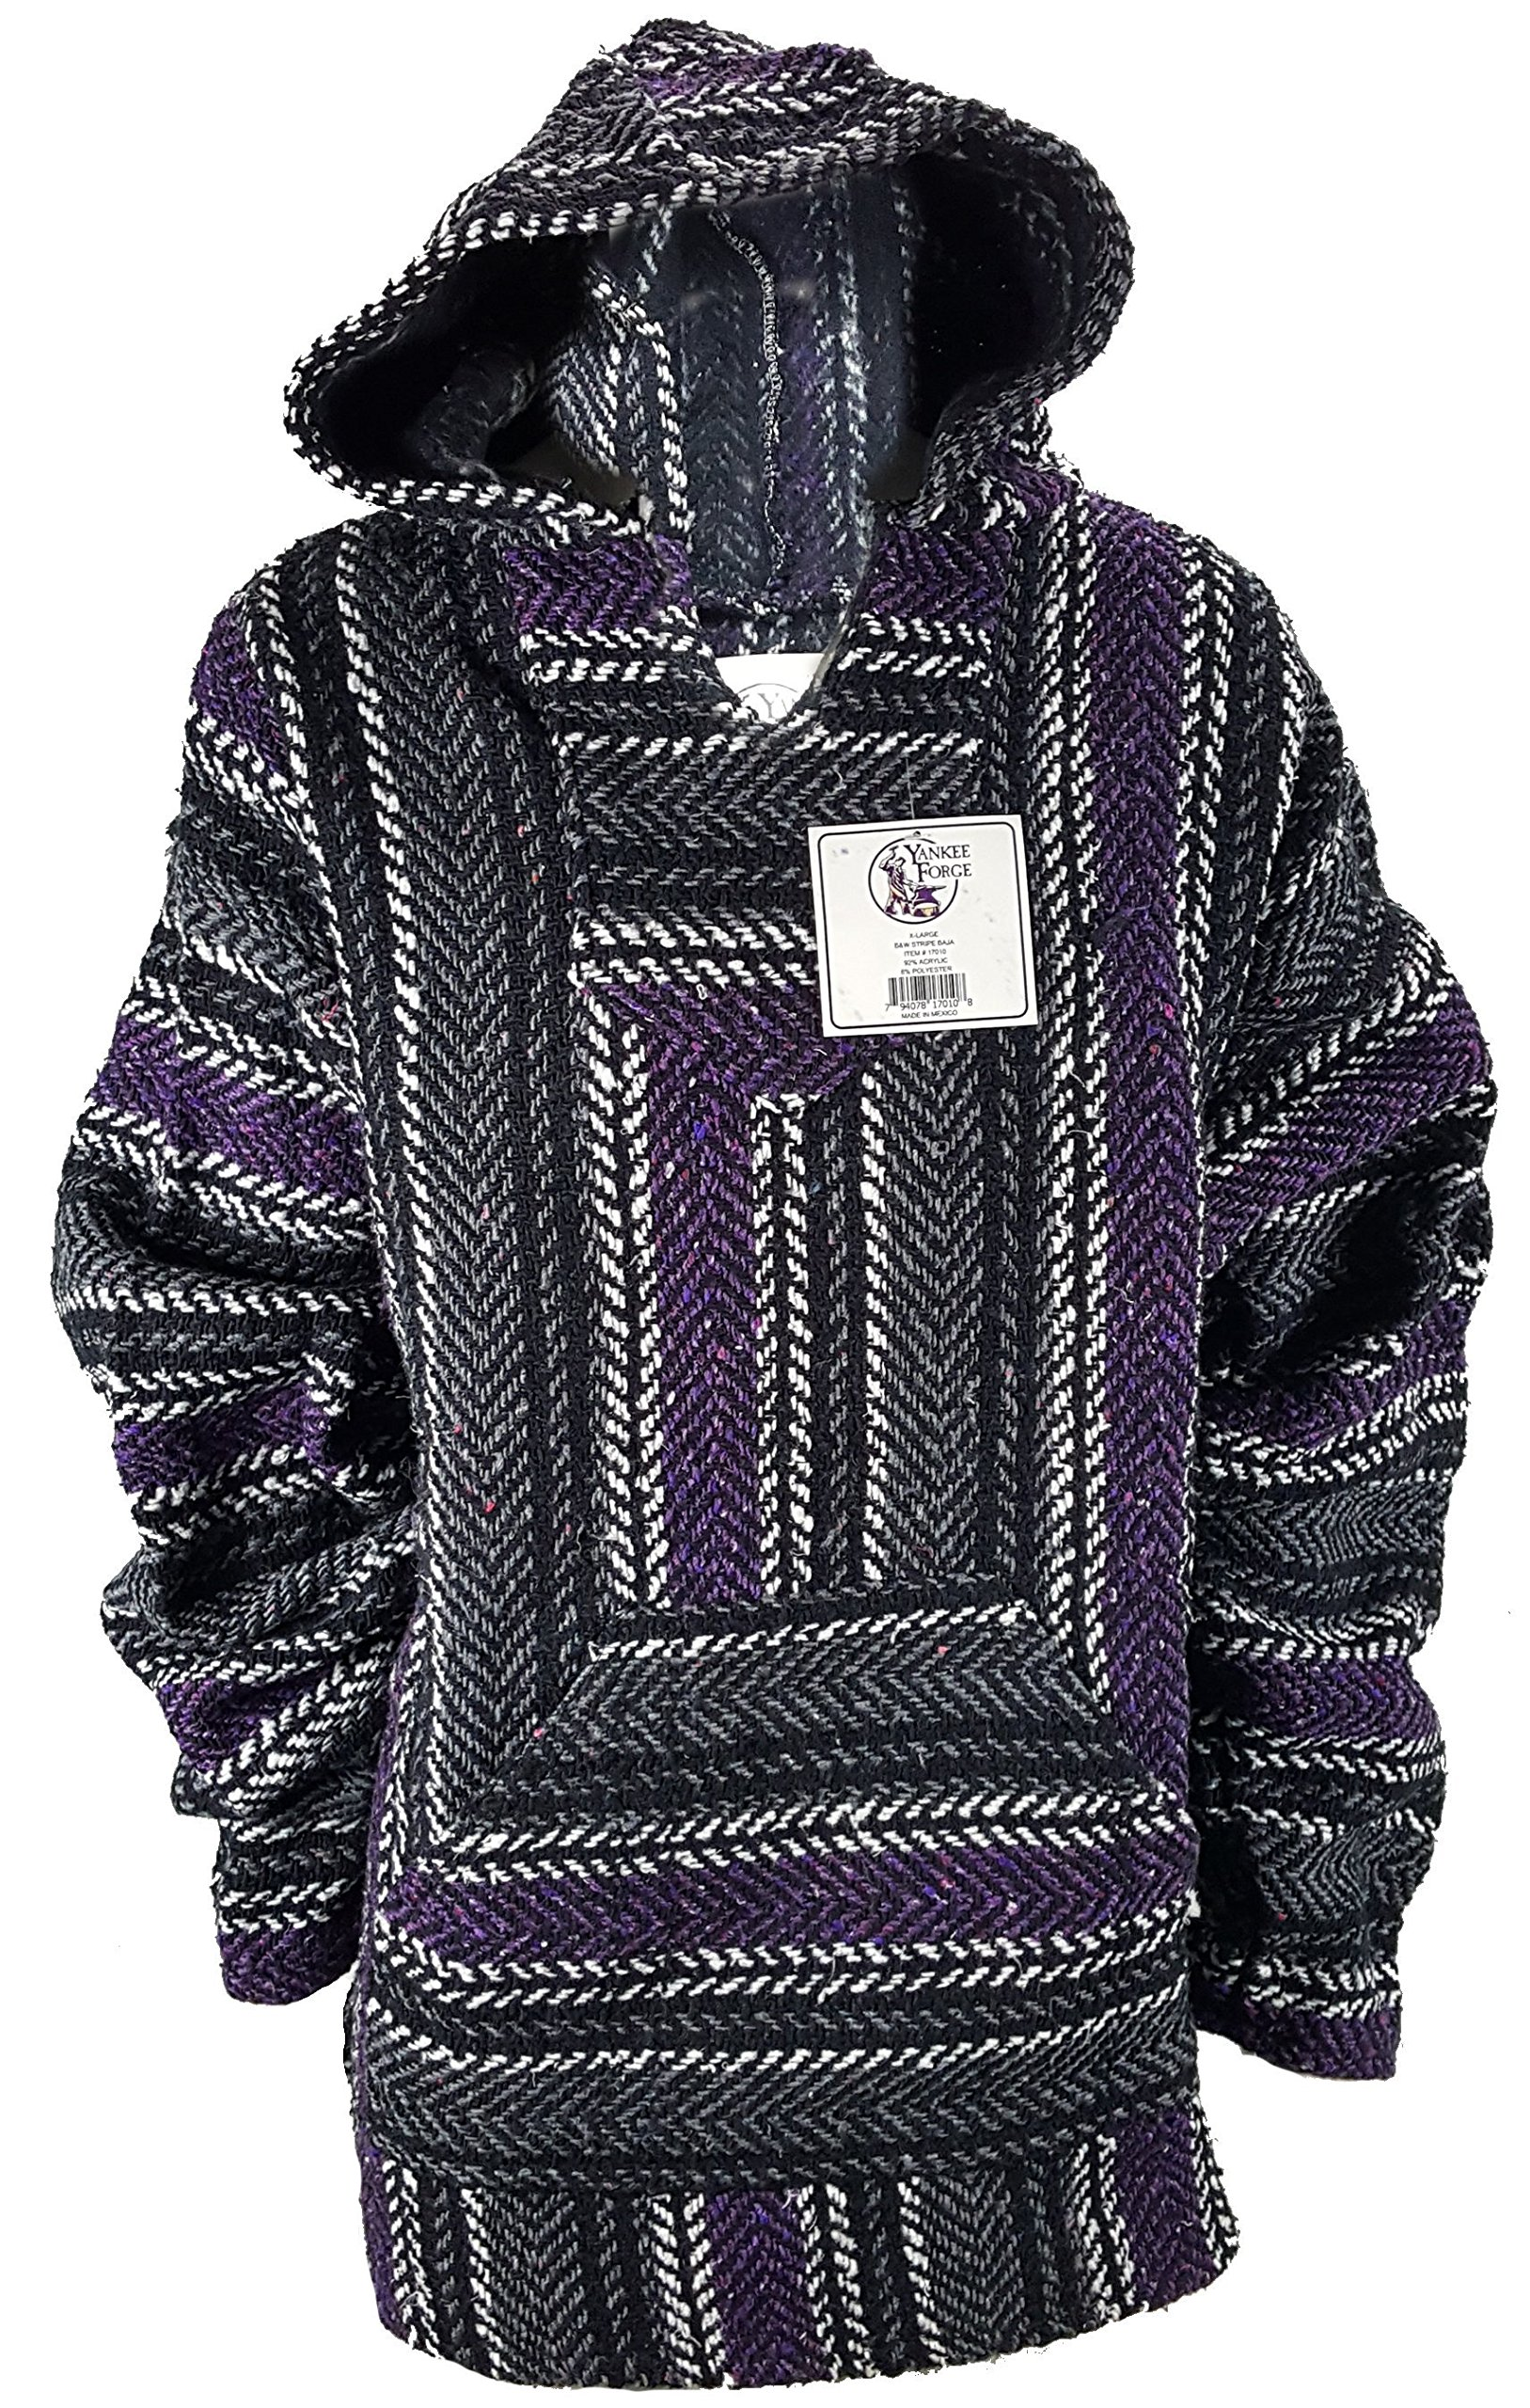 Yankee Forge Large Baja Shirt - Black & Purple Stripe - Woven Hoodie - Soft Brushed Inside - Unisex Pullover